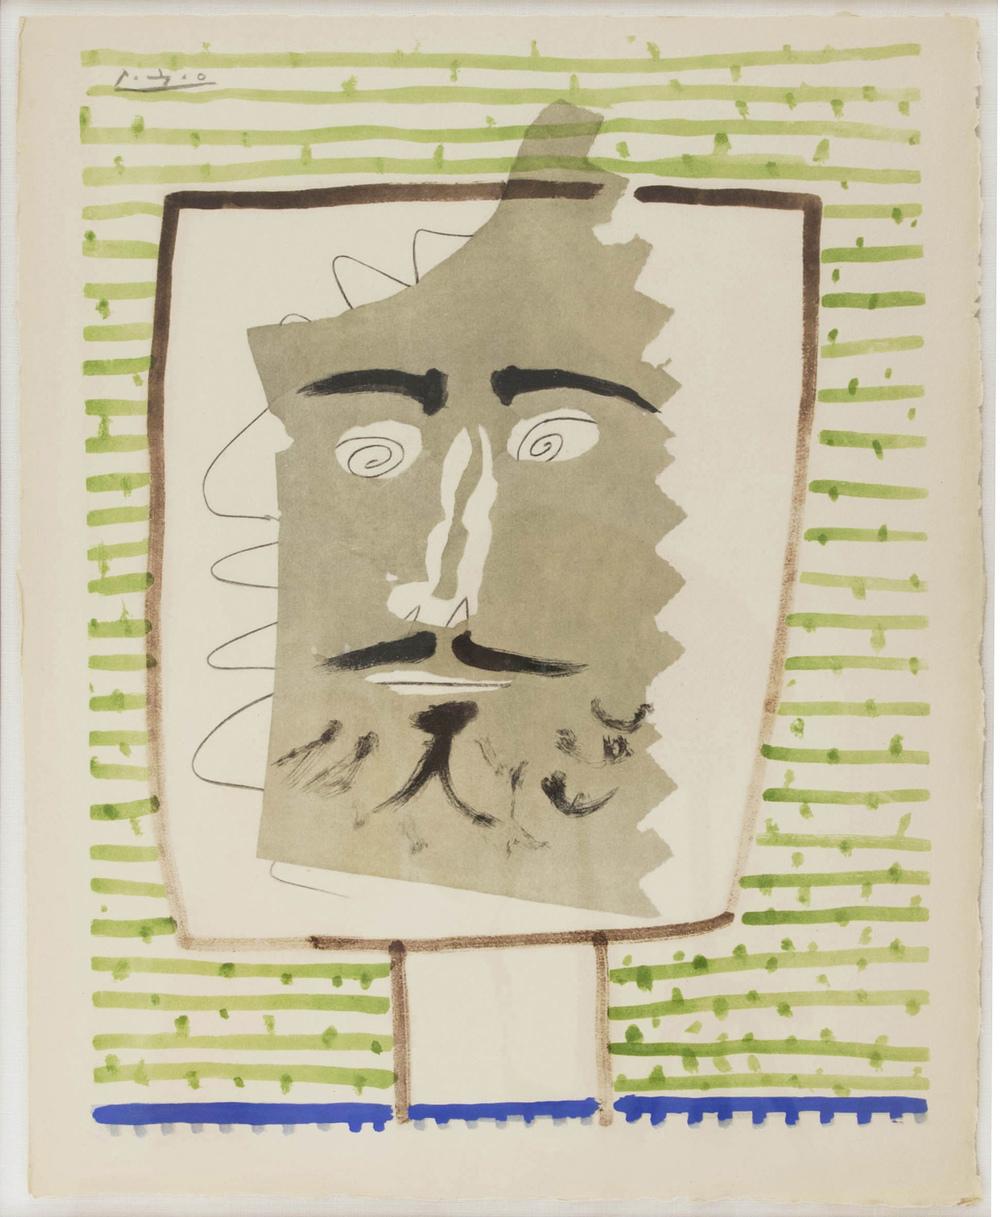 pablo-picasso-head-of-bearded-faune-1956-pochoir-jacomet-unframed.jpg